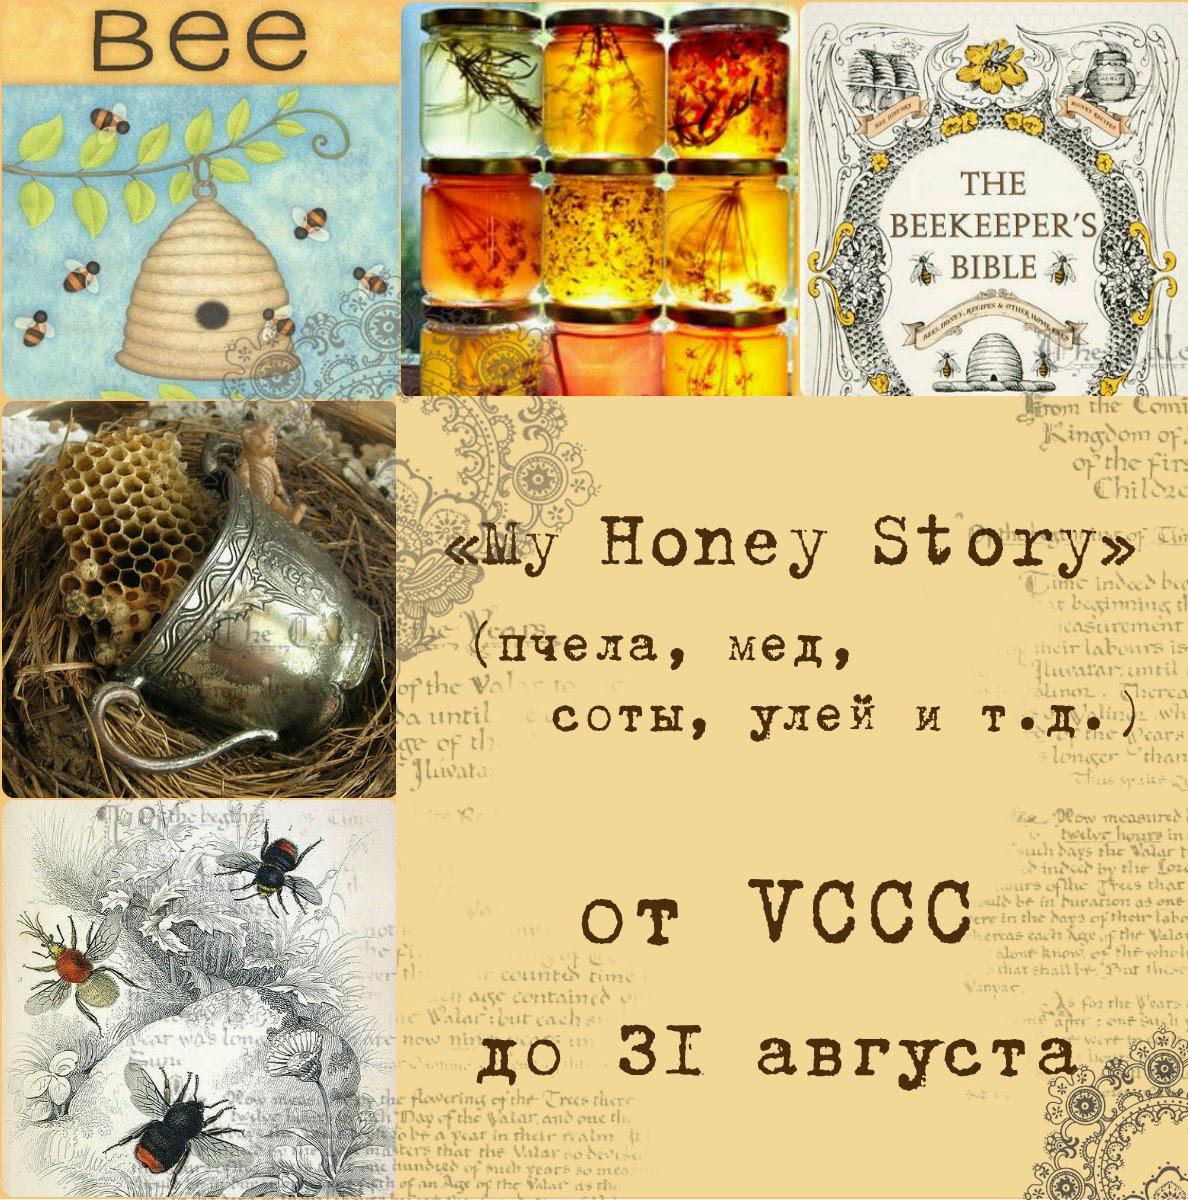 http://vintagecafecard.blogspot.com/2014/08/my-honey-story.html